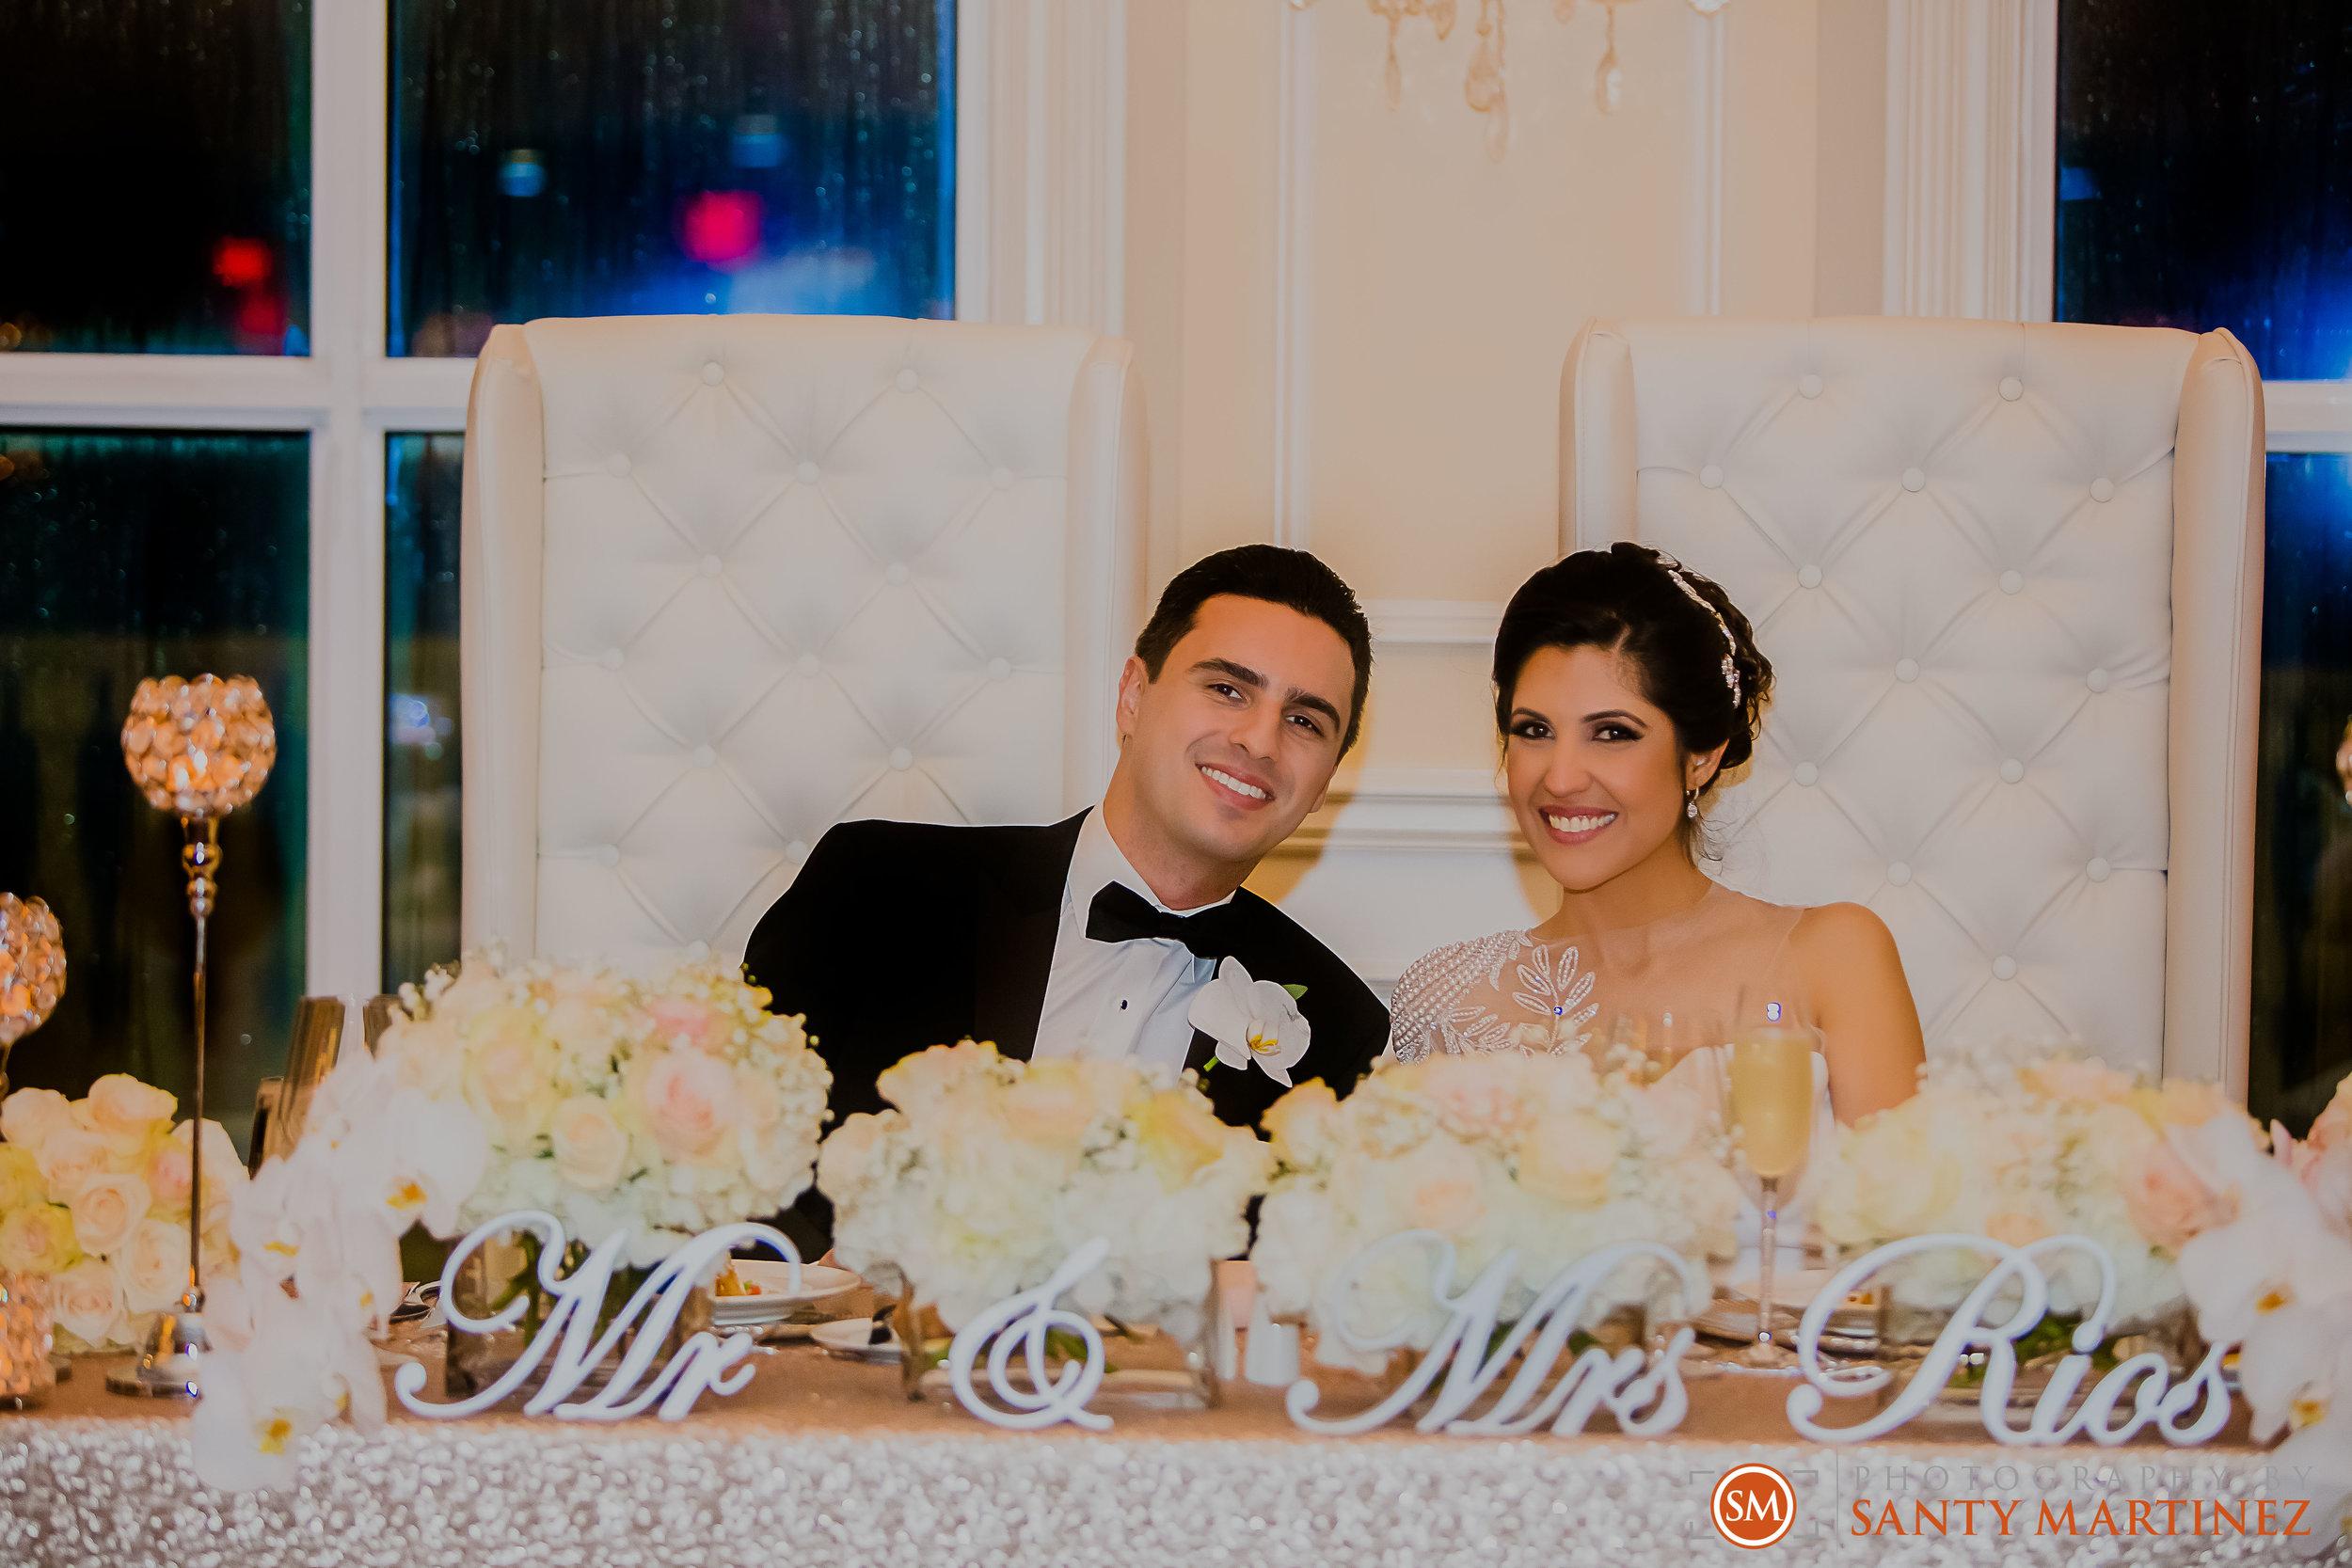 Wedding Trump National Doral Miami - Photography by Santy Martinez-36.jpg